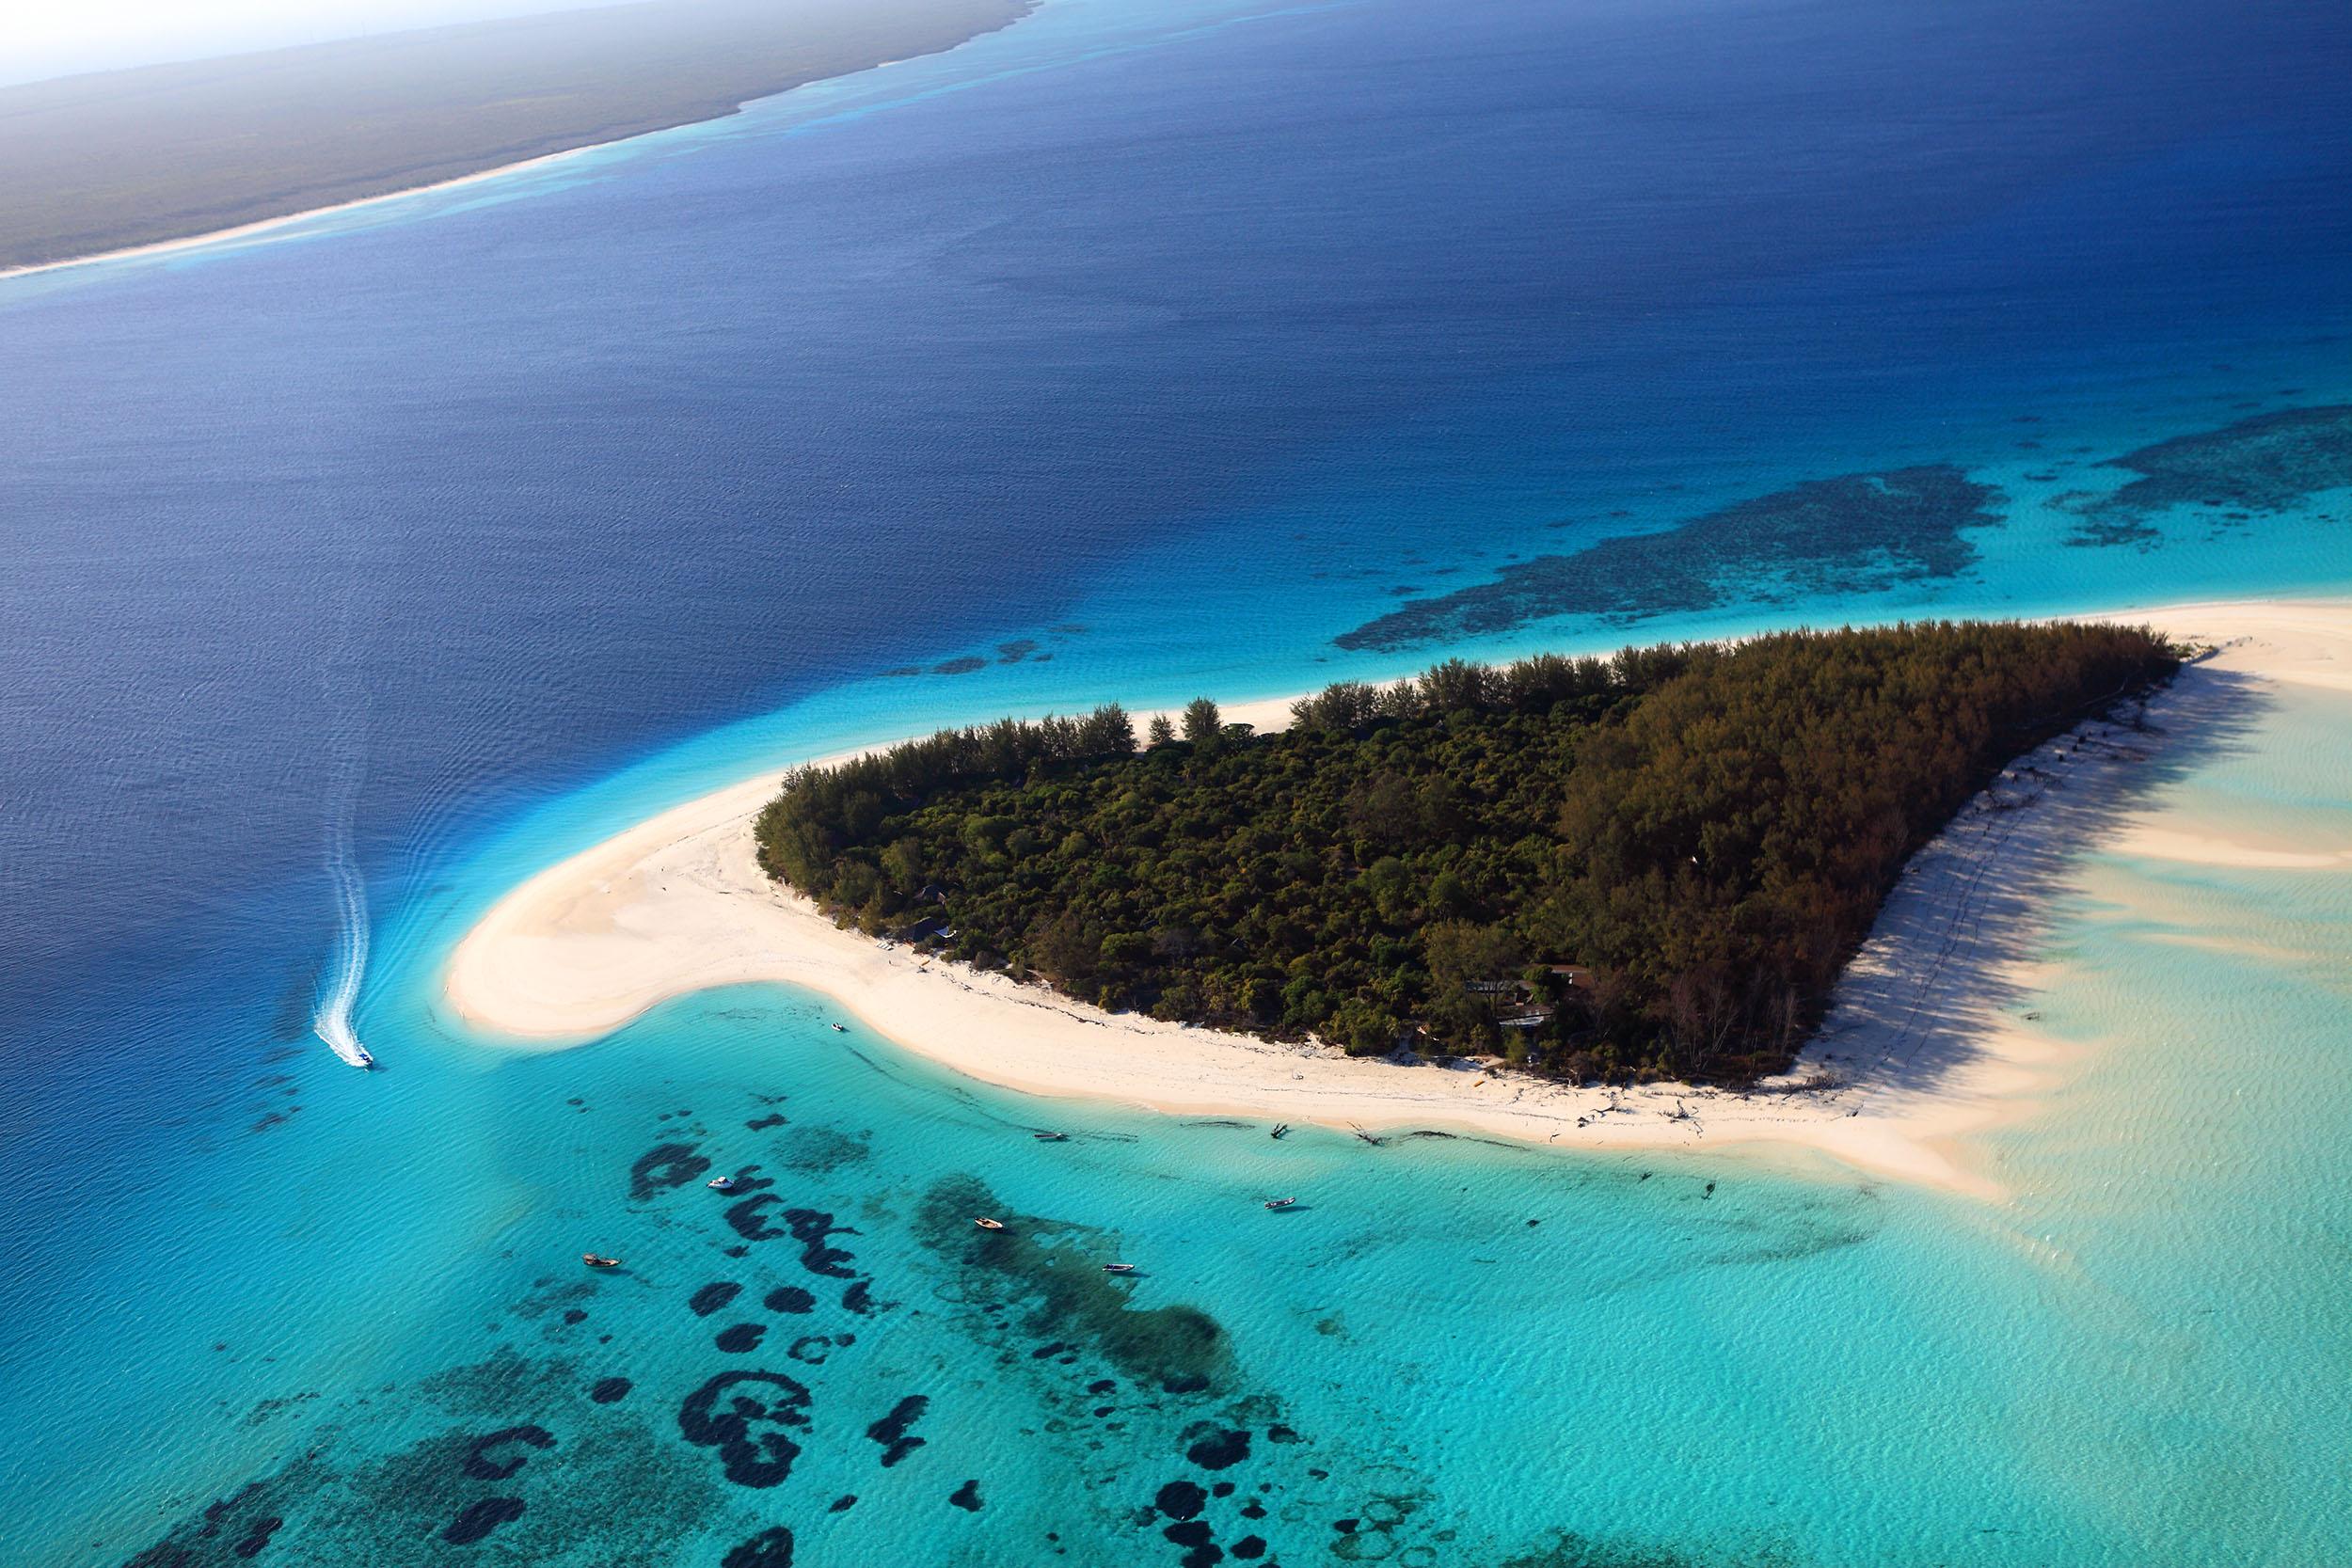 Tanzania zanzibar mnemba island overhead